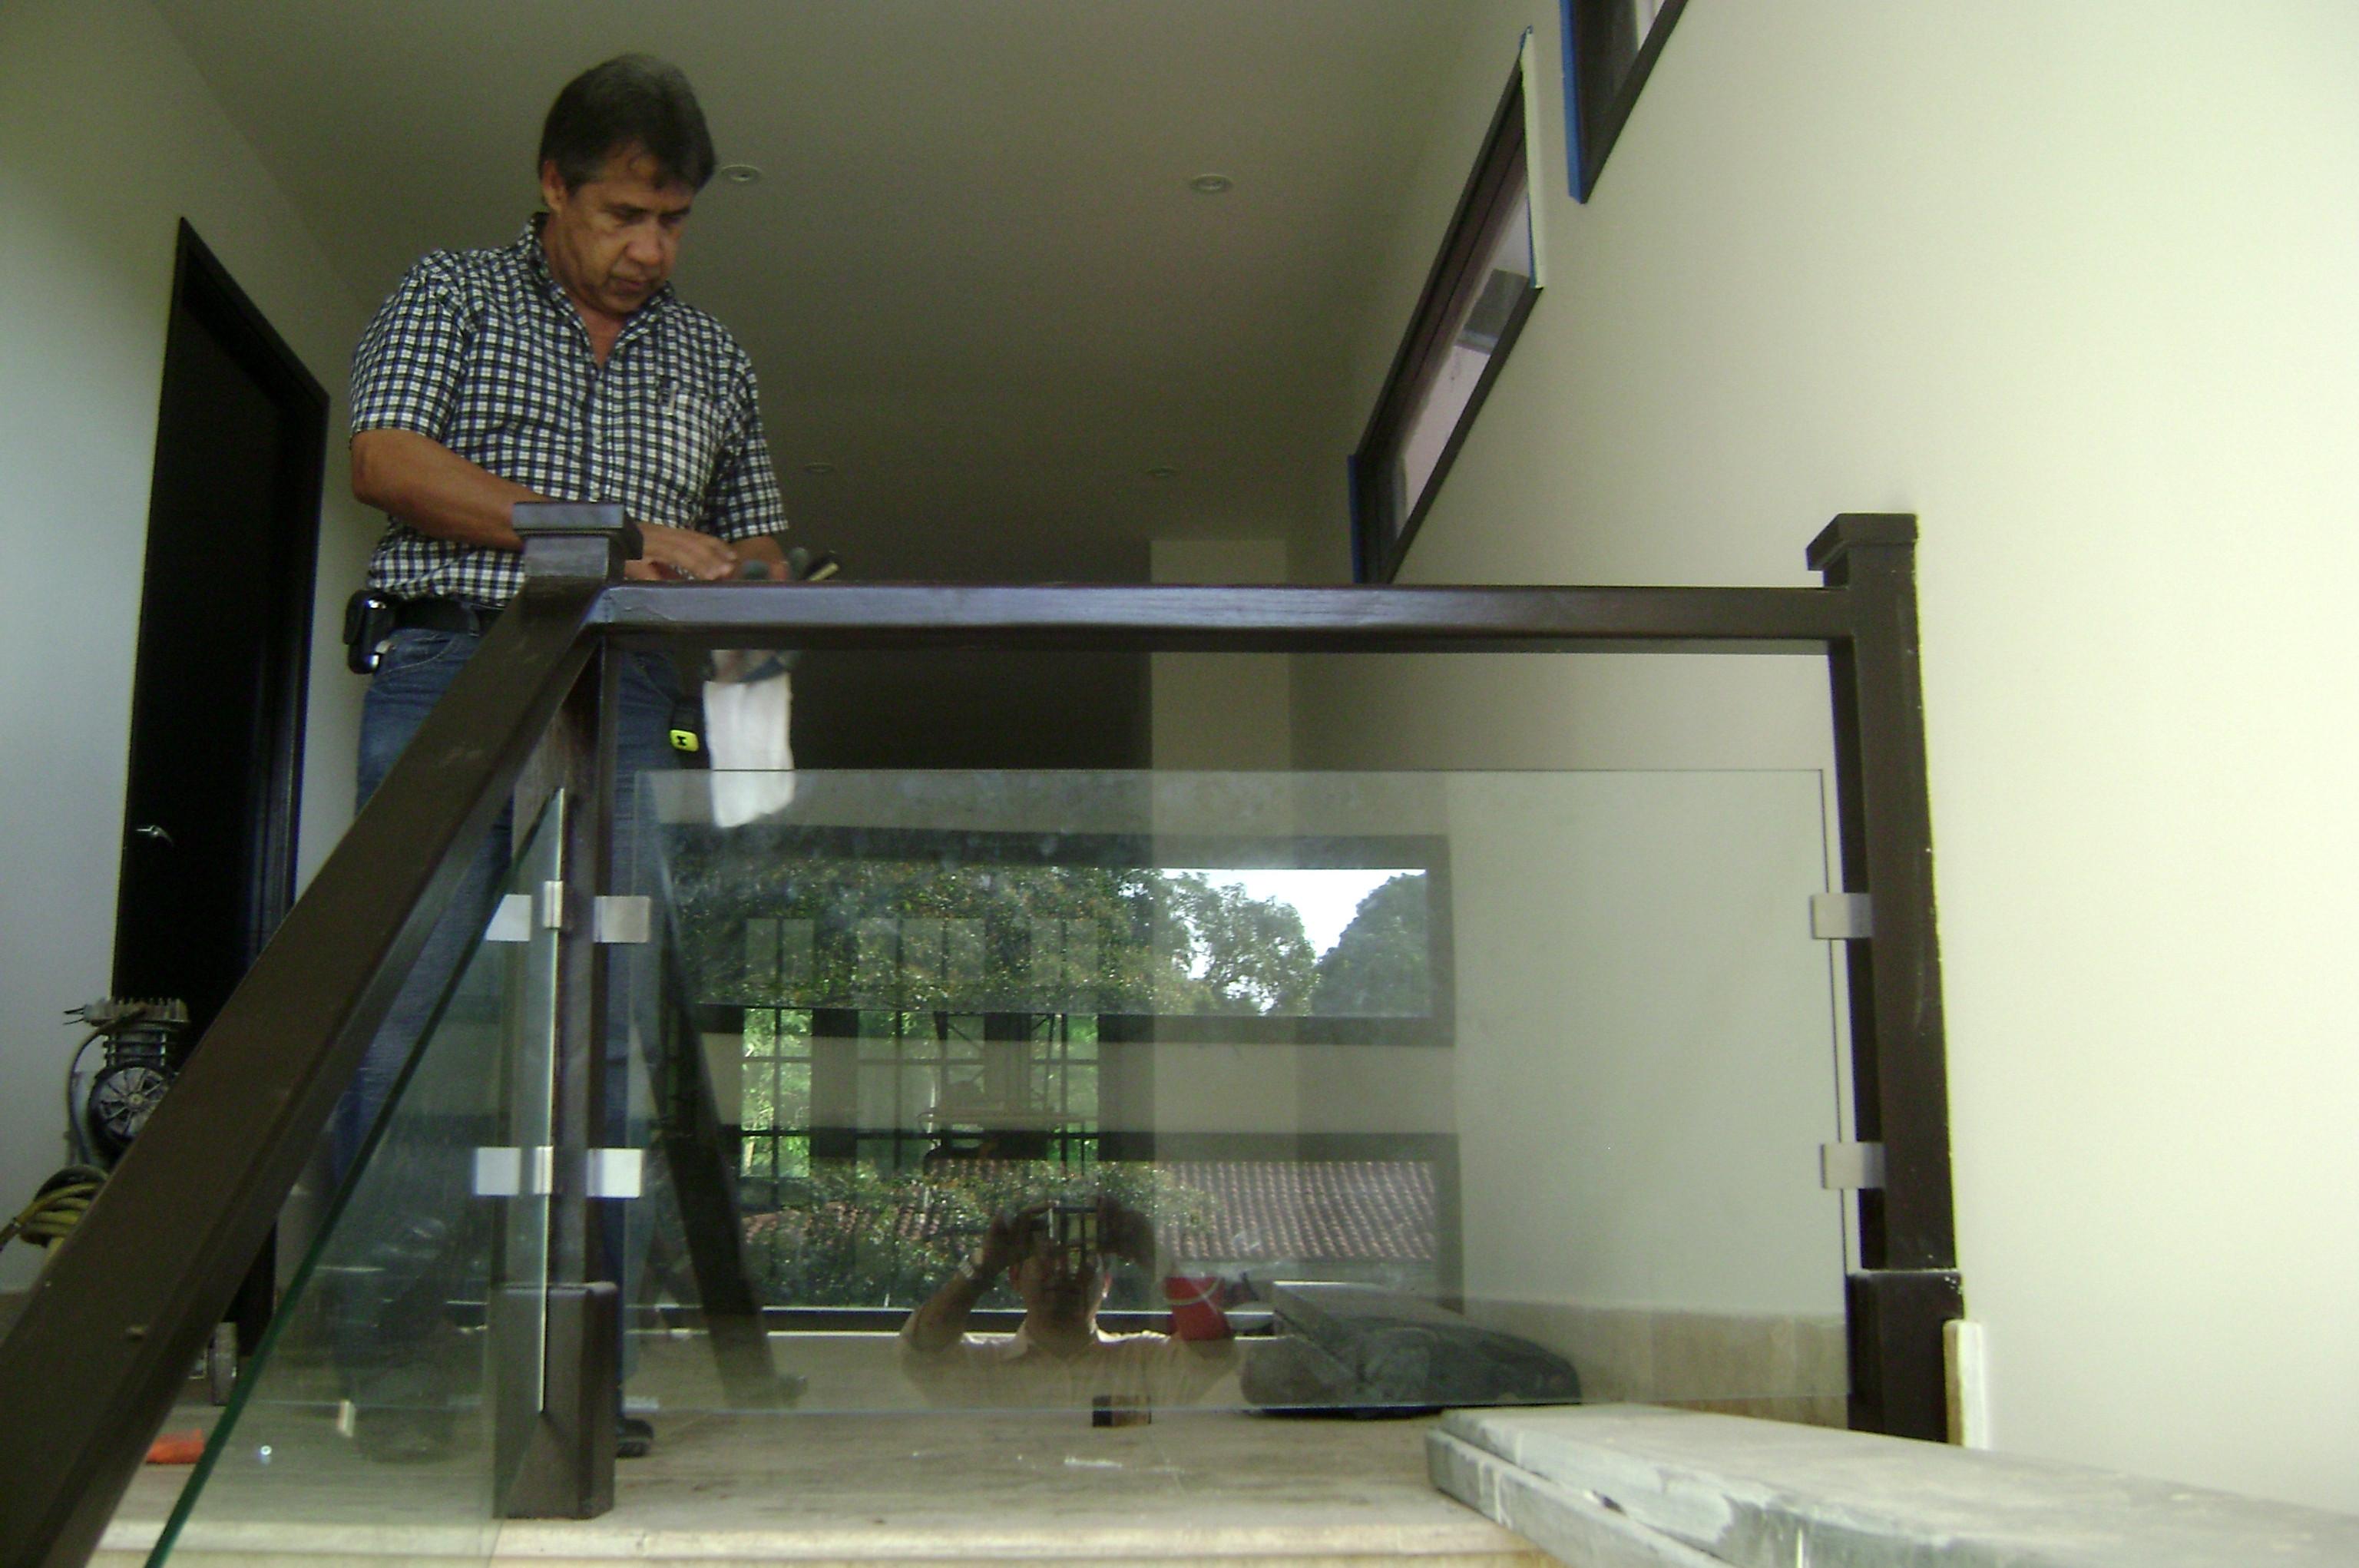 Aluminios y vidrios constructora nigrinis - Barandas de aluminio ...